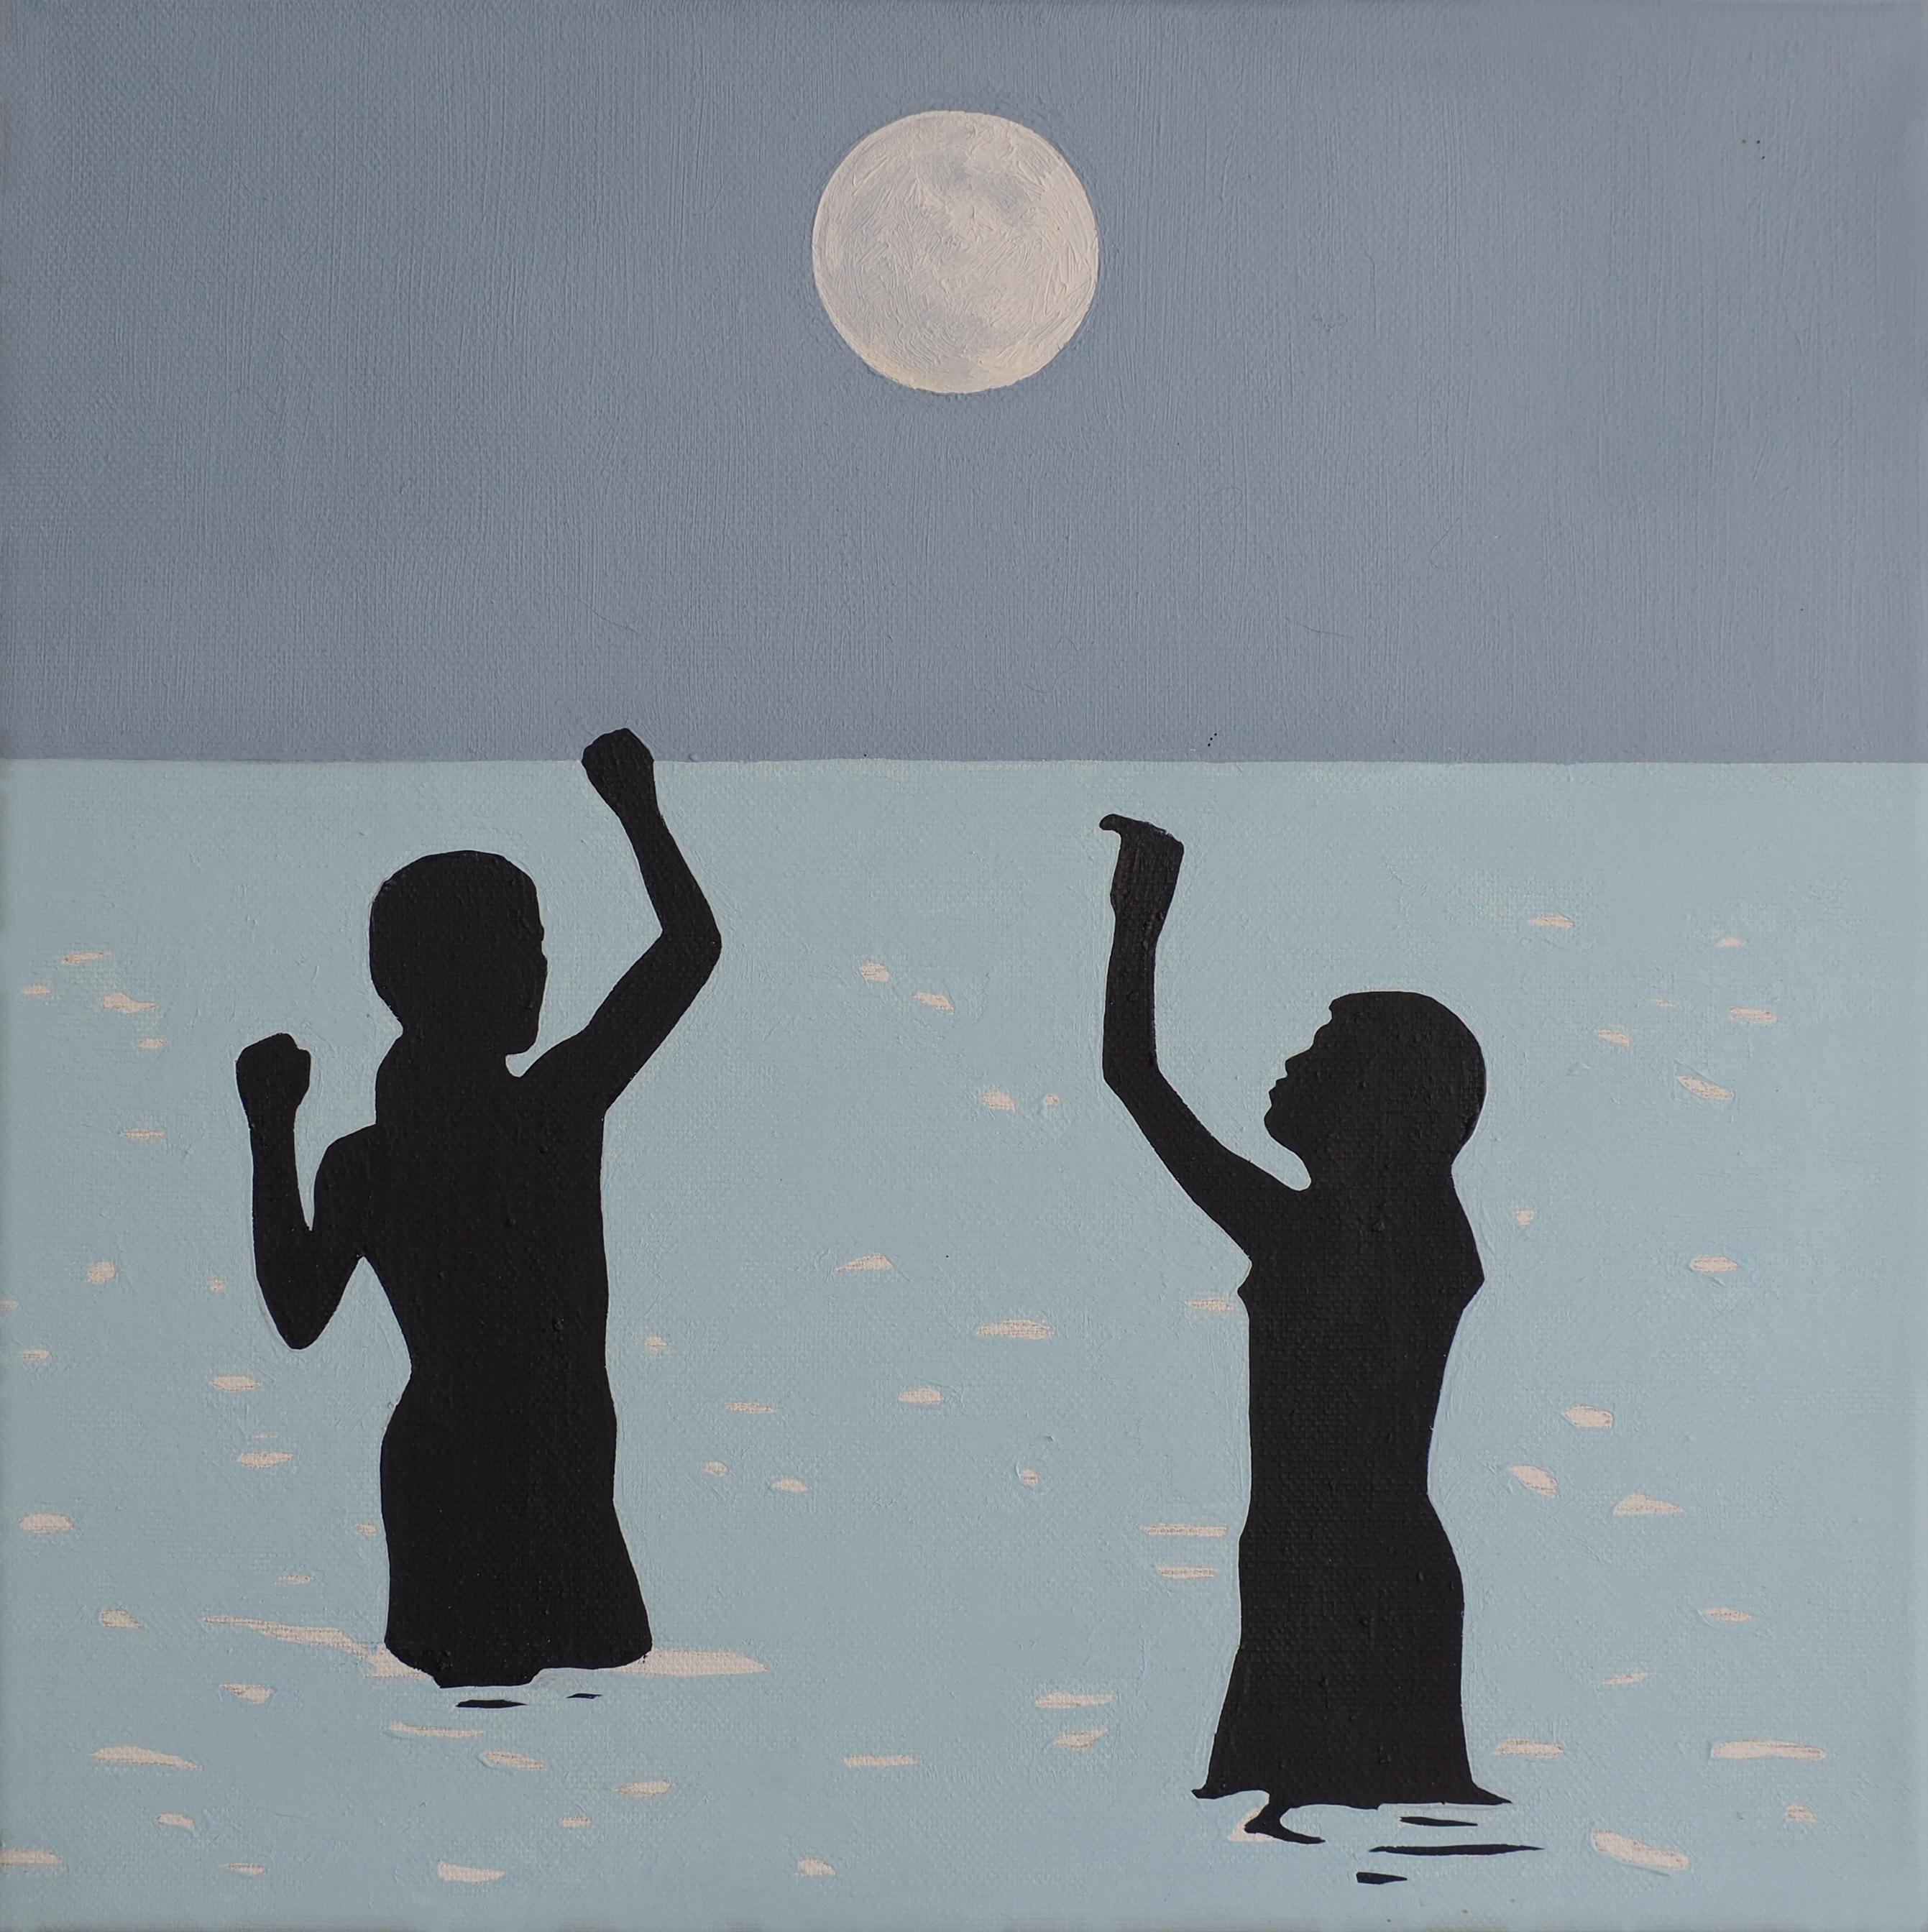 The Moon - Modern Figurative Oil Painting, Sea View, Landscape, Romantic Art